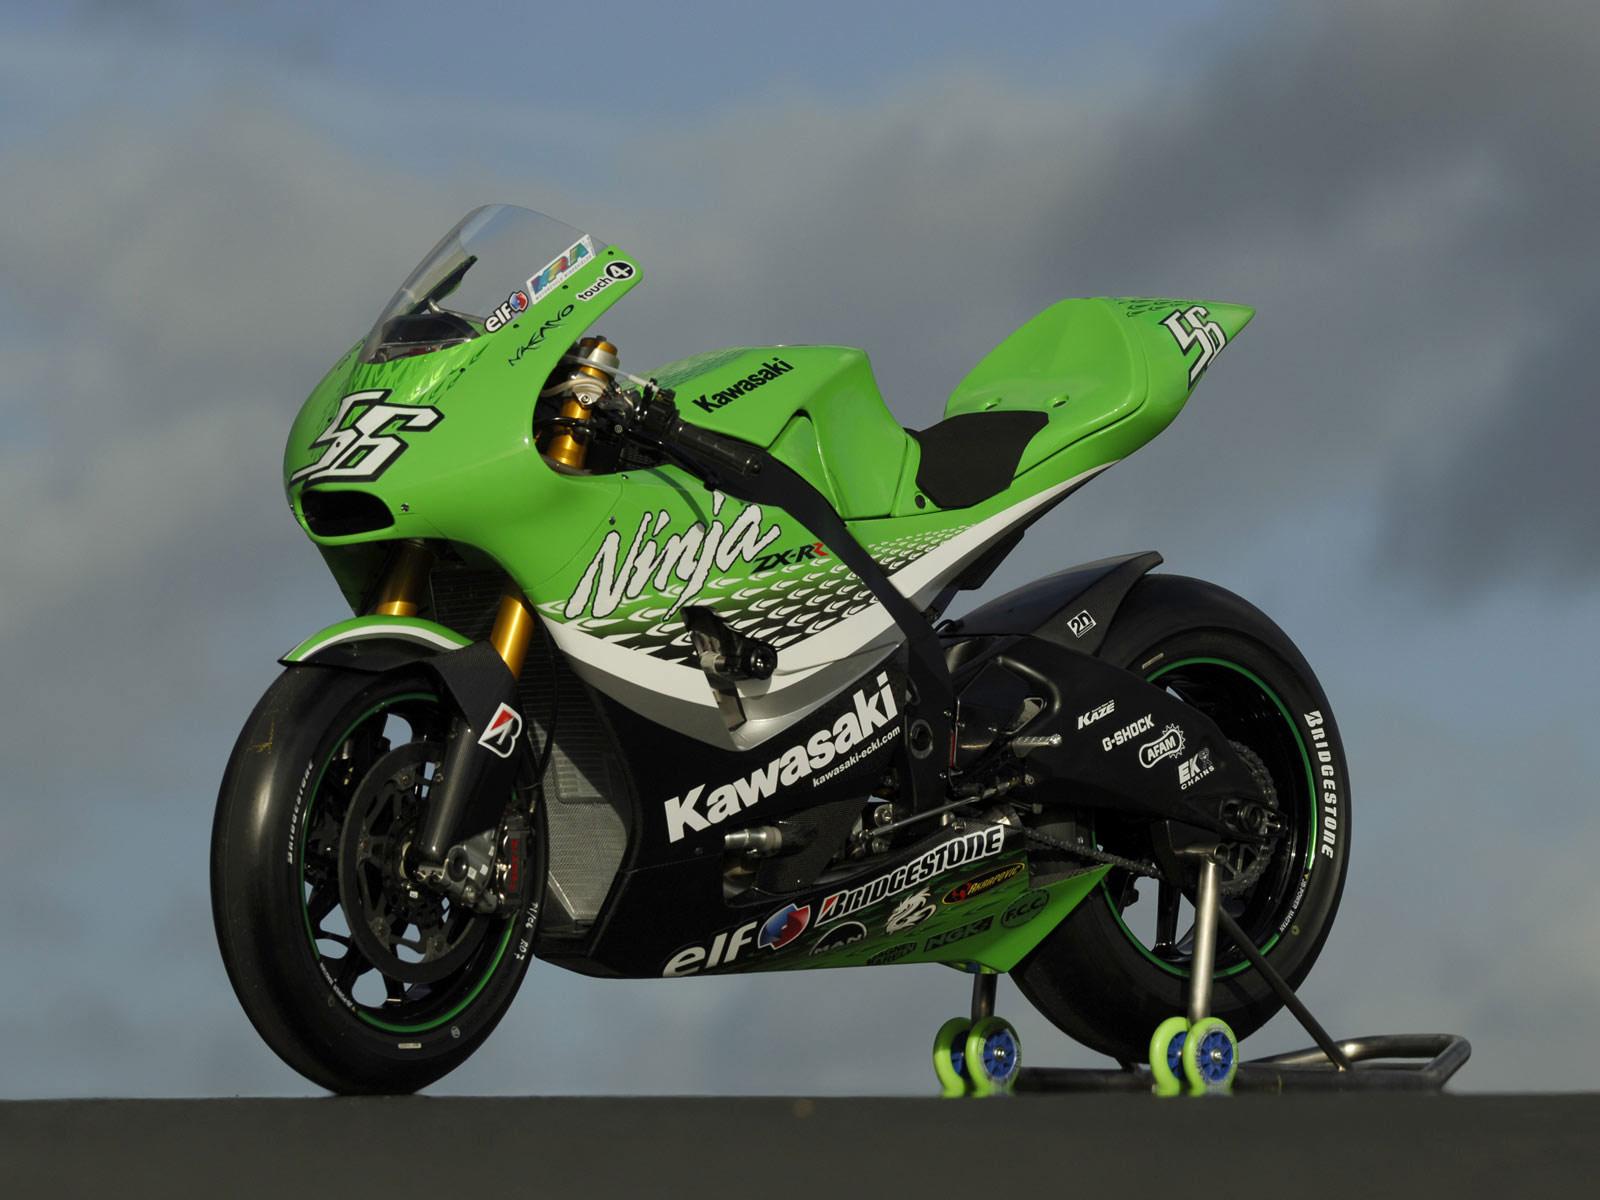 http://2.bp.blogspot.com/-YlL8f9jr2bY/Tm17axtF8qI/AAAAAAAAA0w/J-A4WfHcrbA/s1600/kawasaki_ninja-ZX-RR_2006_motorcycle-desktop-wallpaper_1.jpg